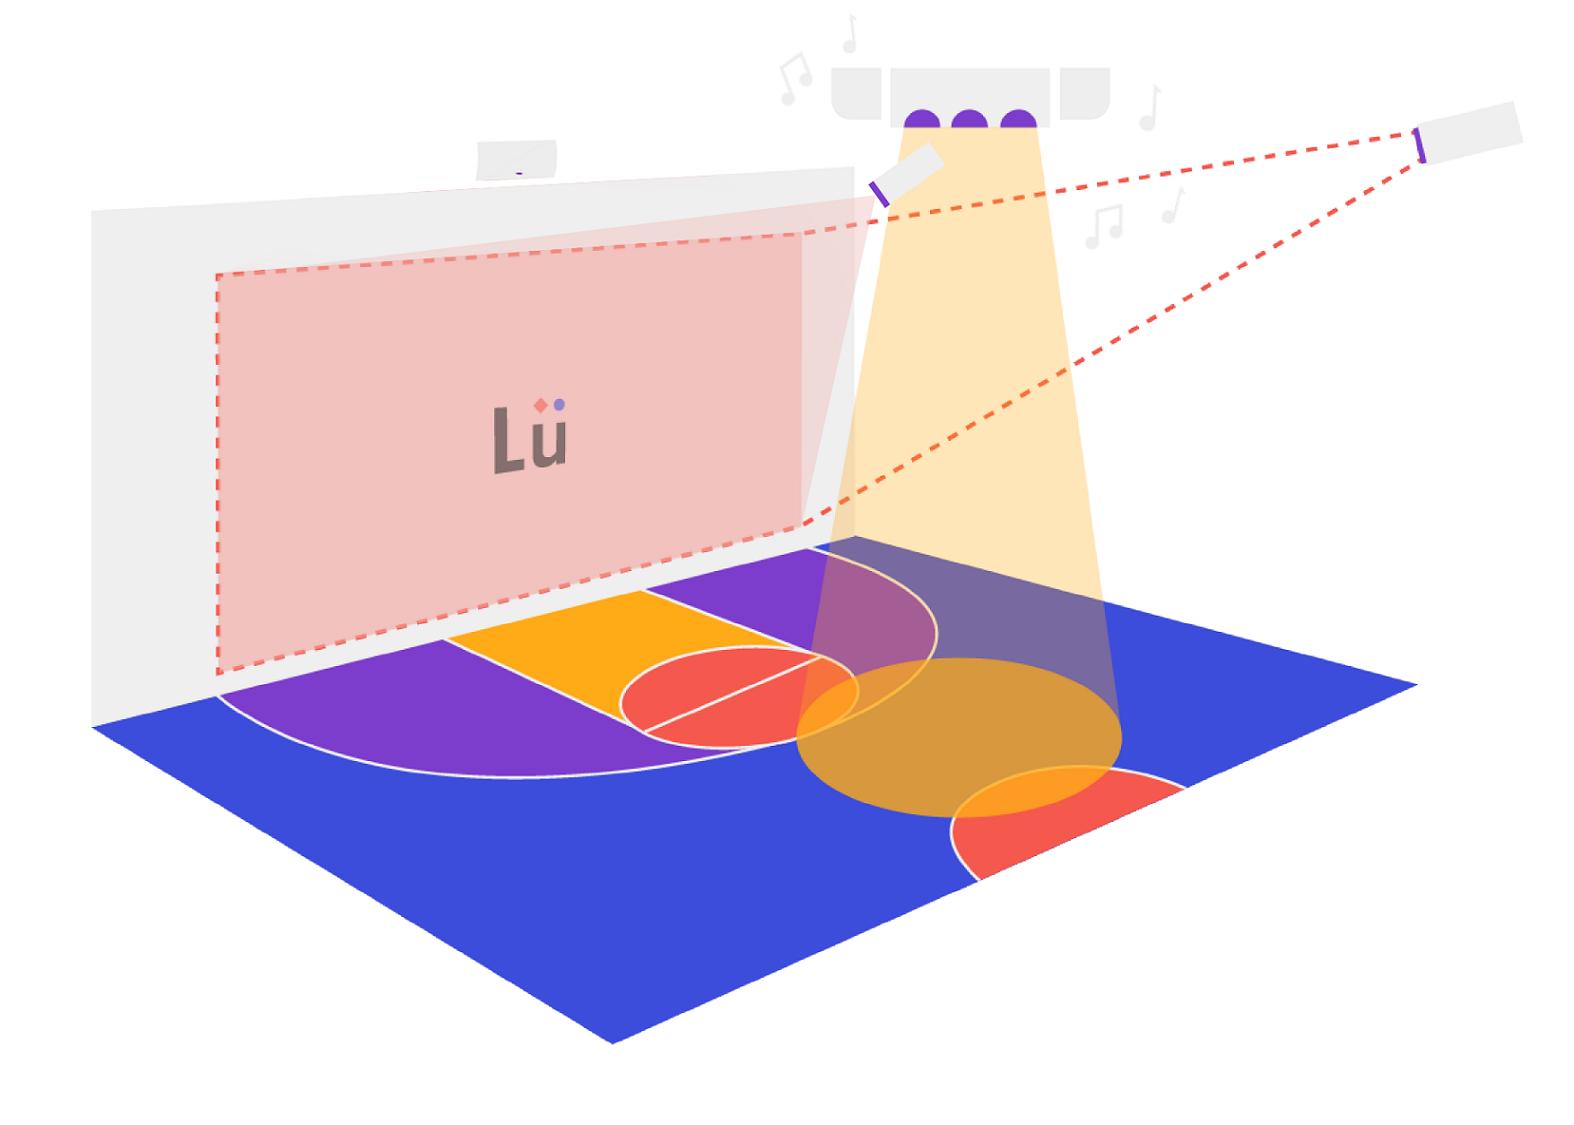 système Lü configuration UNO